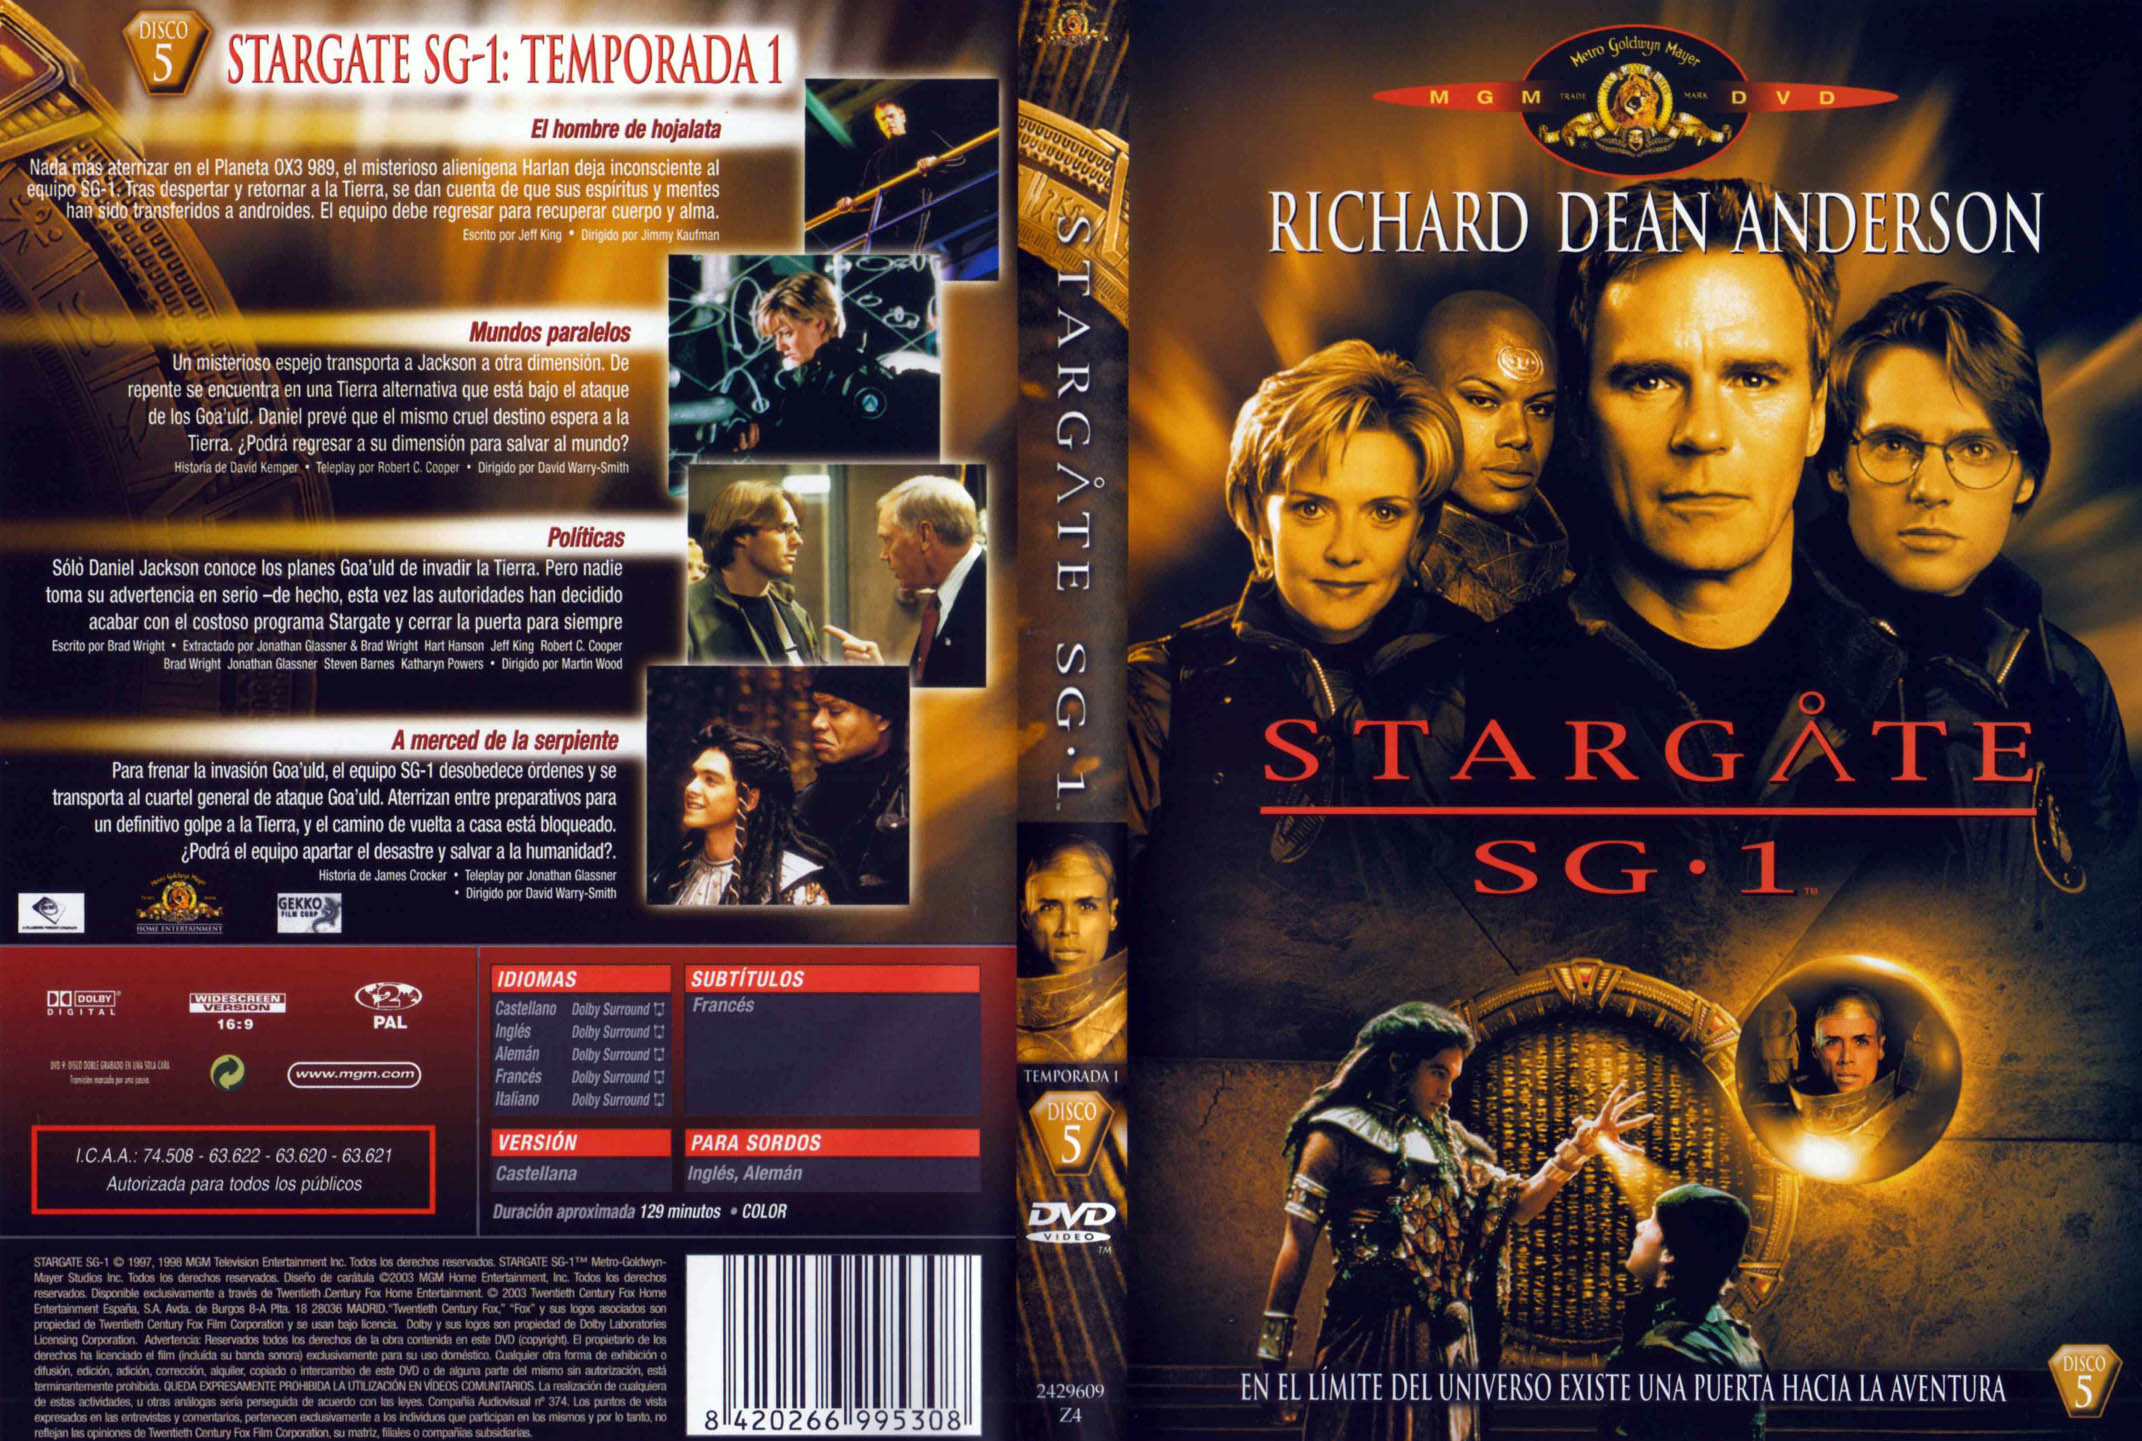 Stargate_SG_1_Temporada_1_Disco_5-Caratula